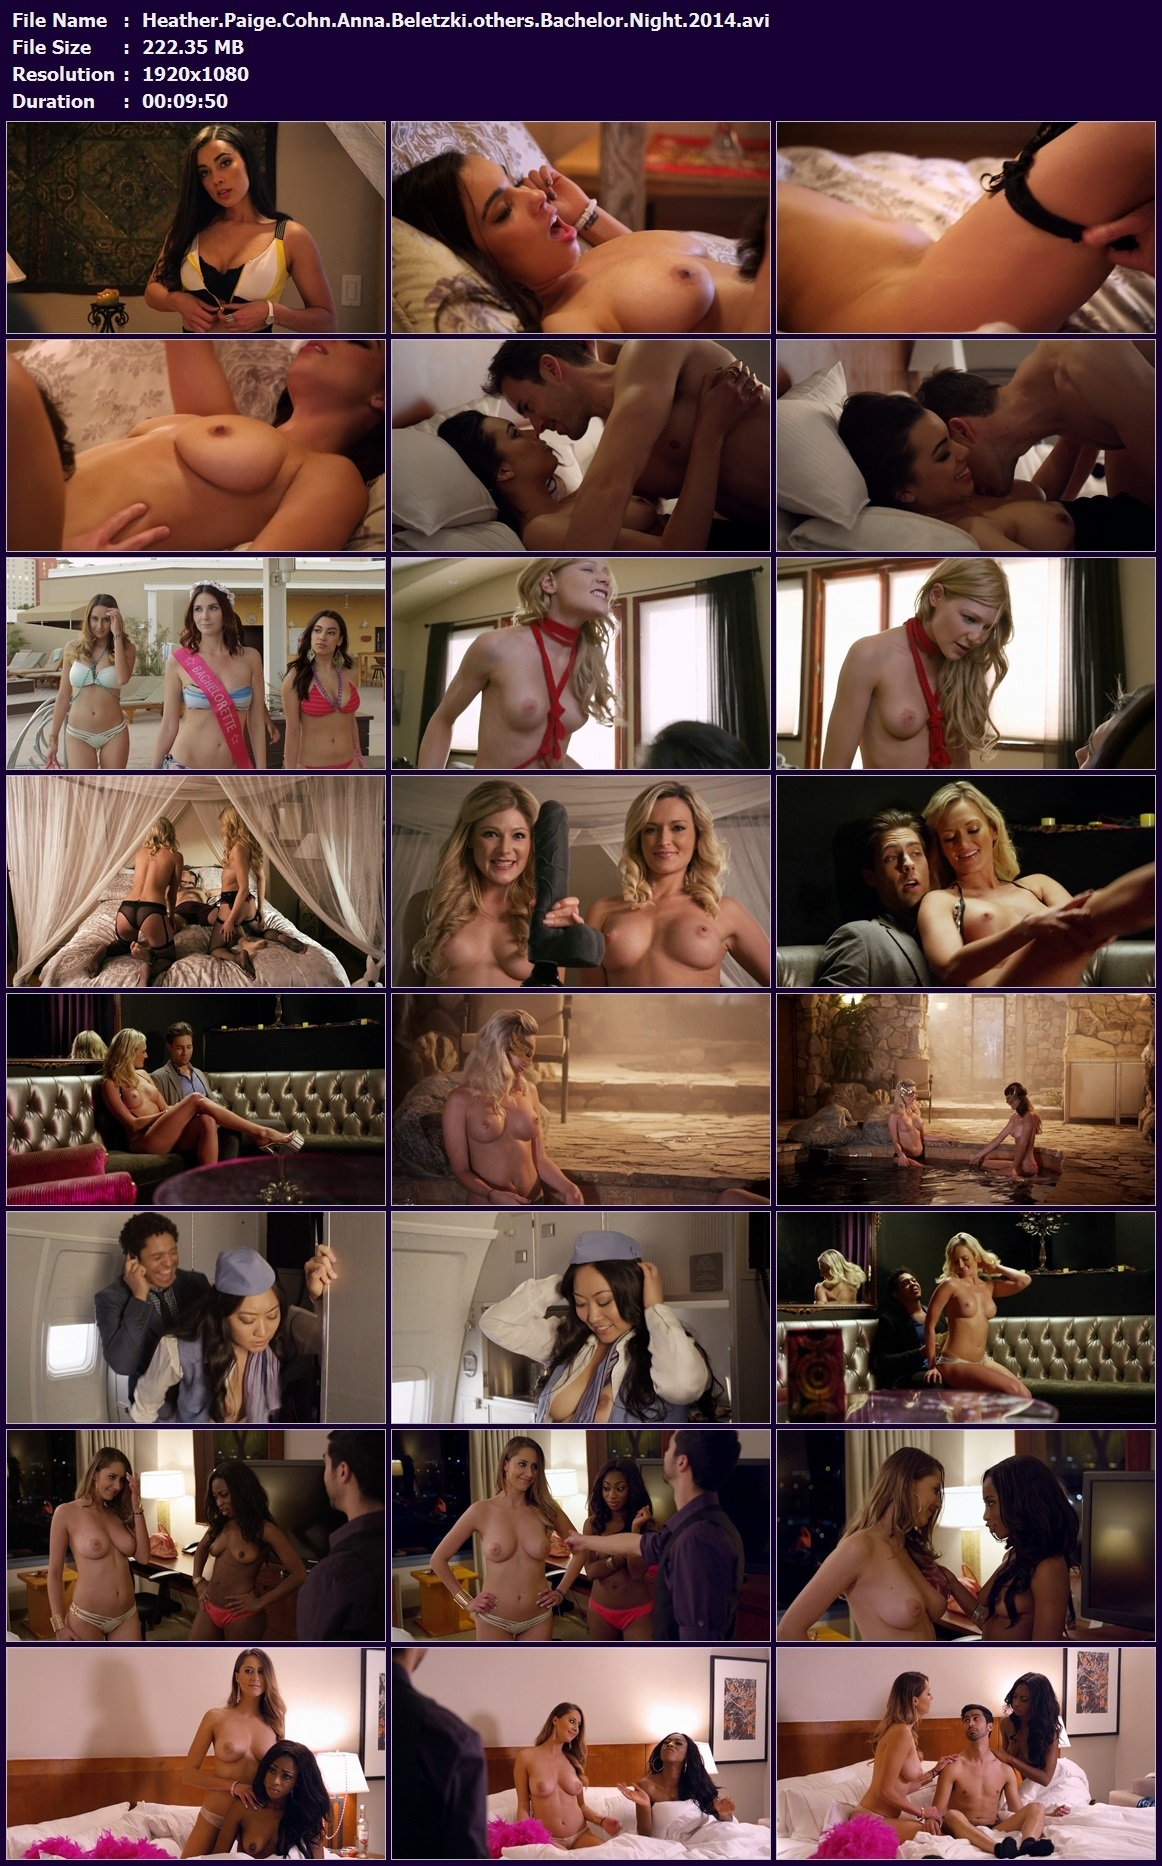 Heather.Paige.Cohn.Anna.Beletzki.others.Bachelor.Night.2014.avi